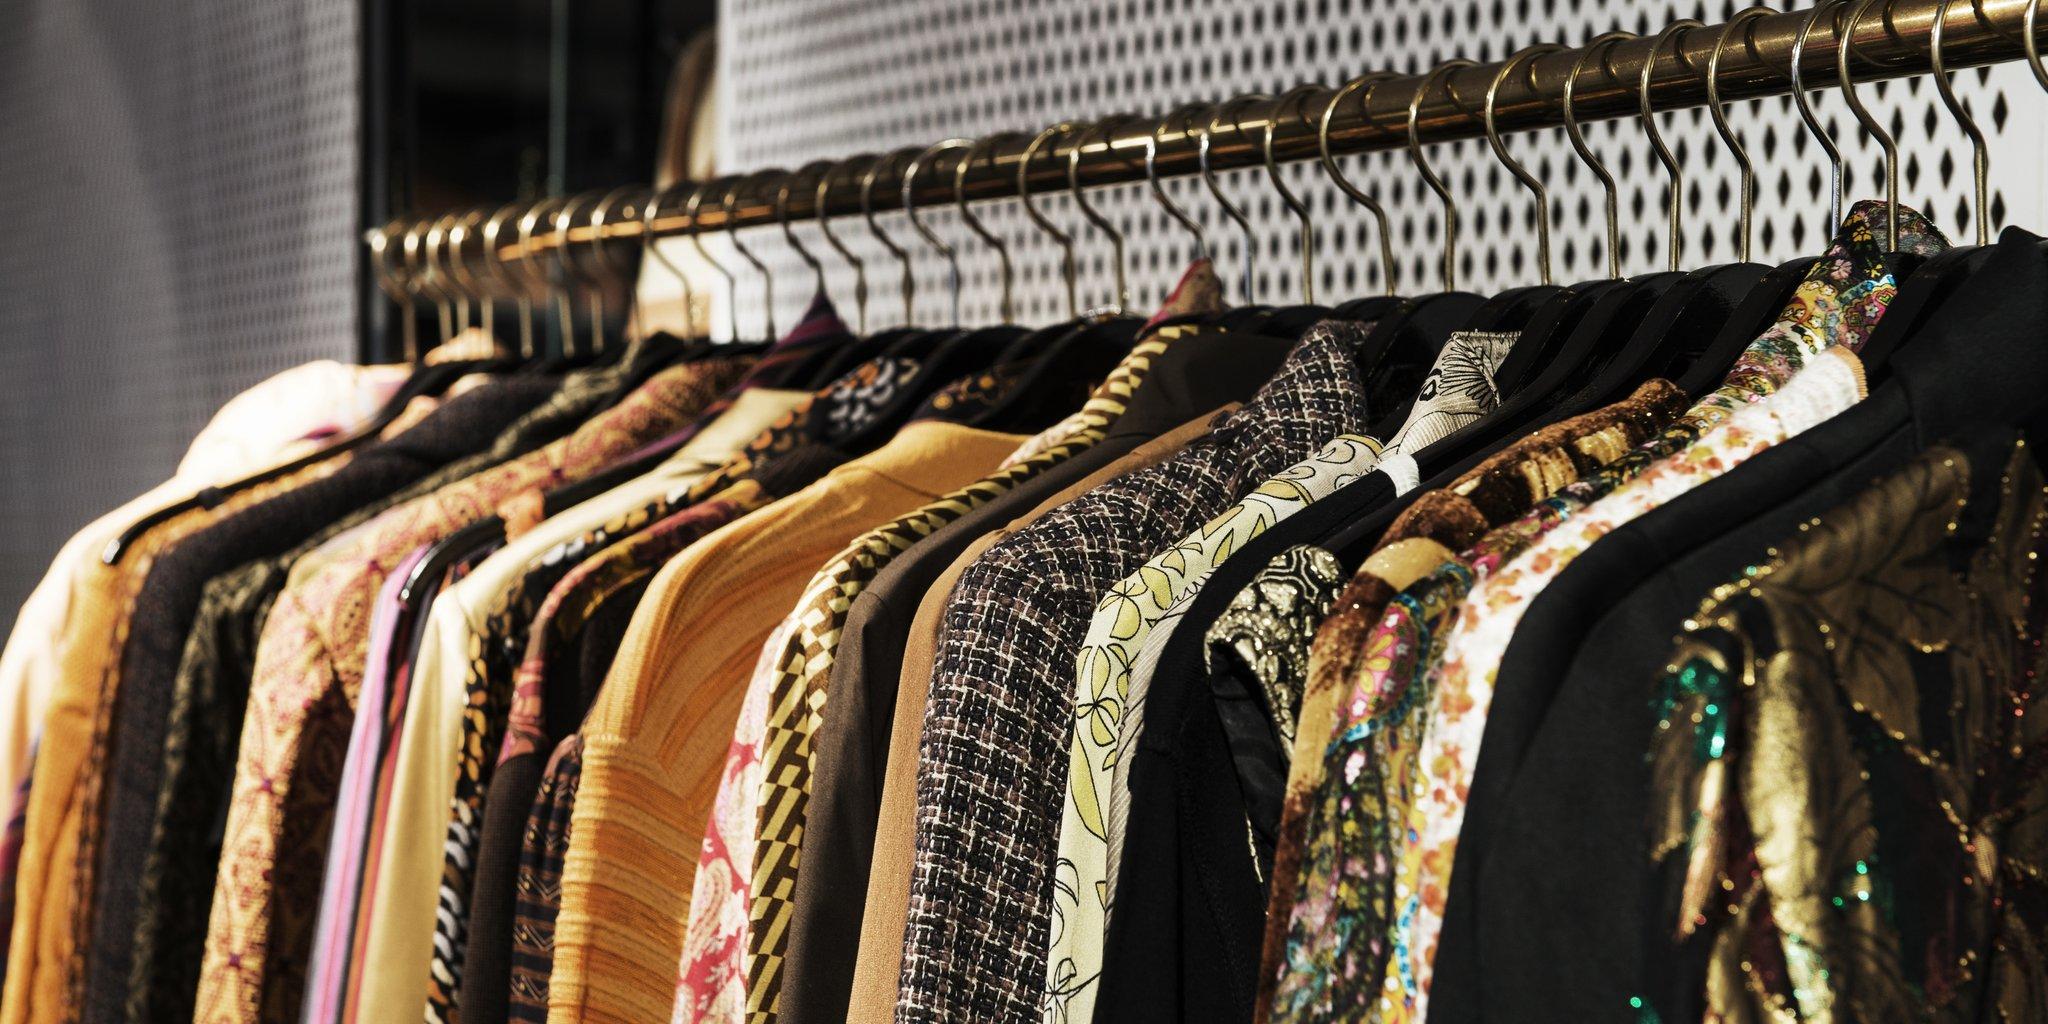 De bedste secondhand butikker i Danmark | Costume.dk